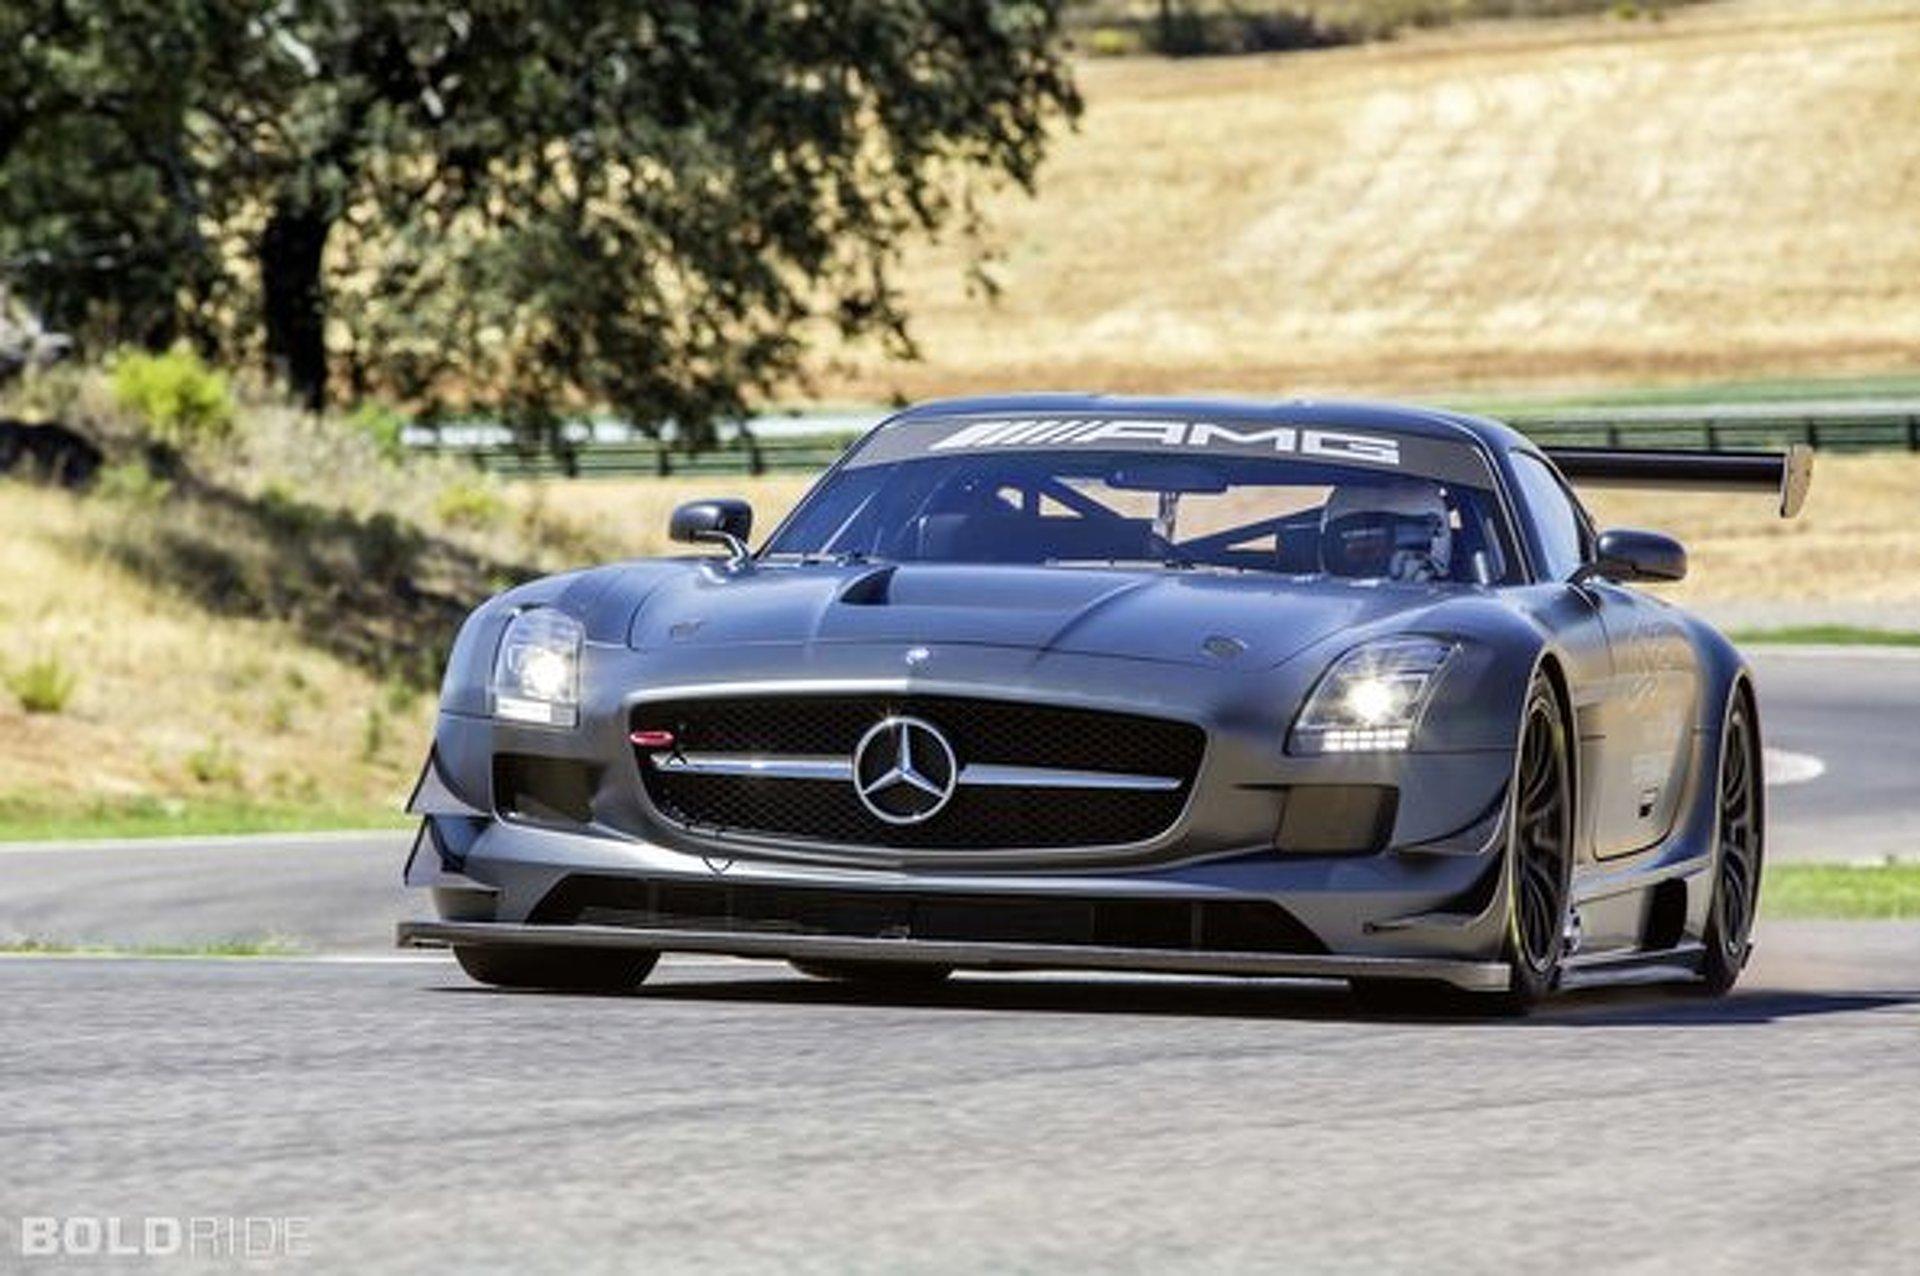 SLS AMG GT3 Brings Mercedes-Benz Back to Racing Glory